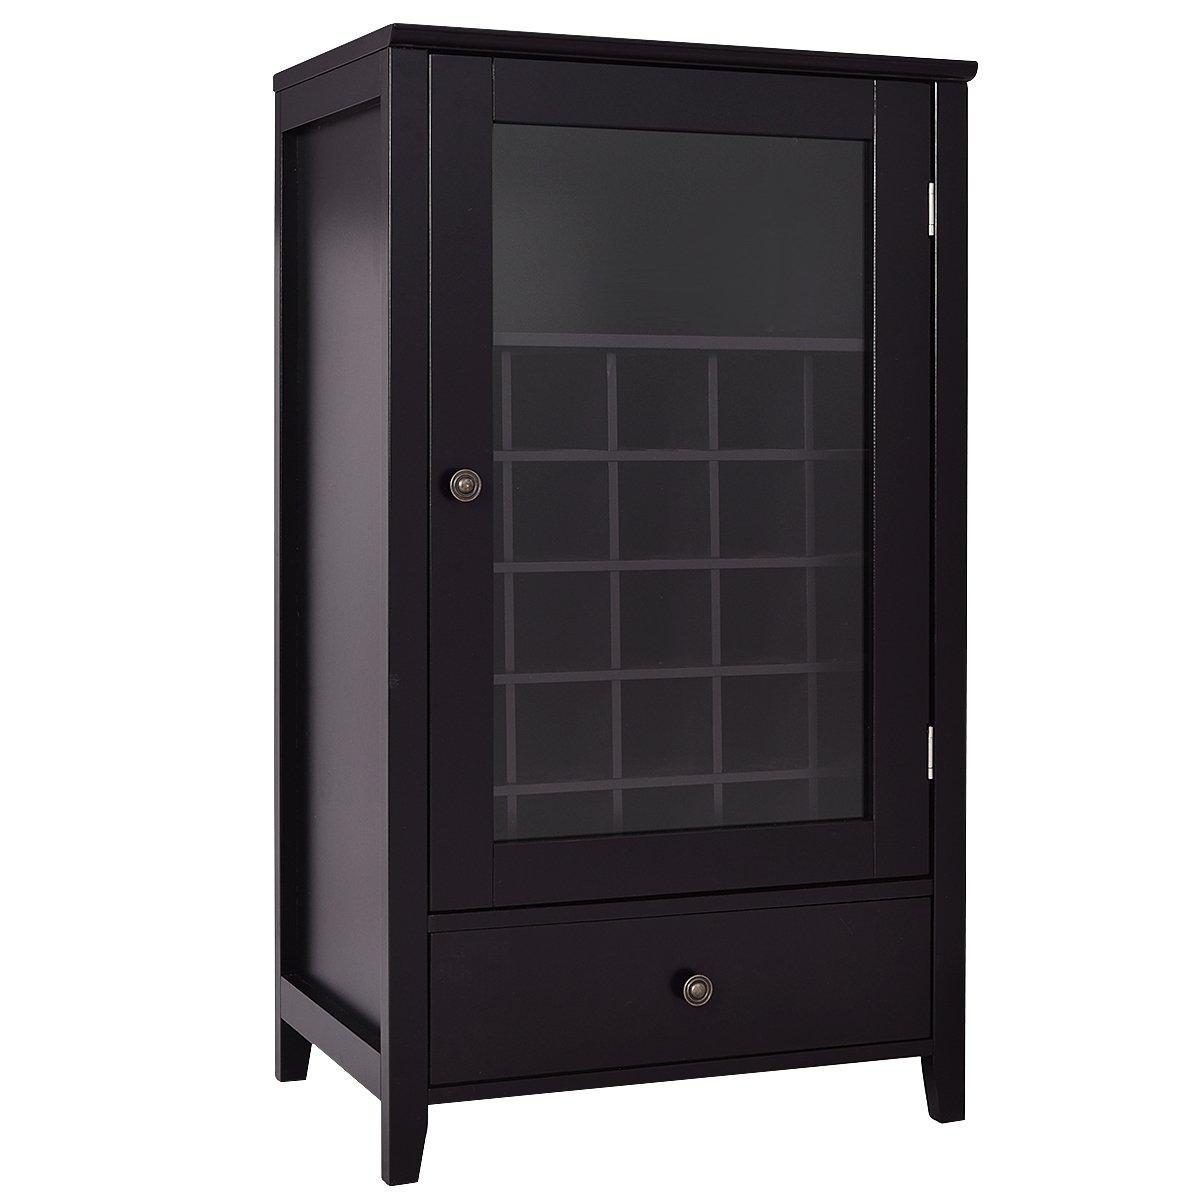 Giantex Wood Wine Cabinet Storage Home Shelf Wine Bottle Holder w/Drawer Brown by Giantex